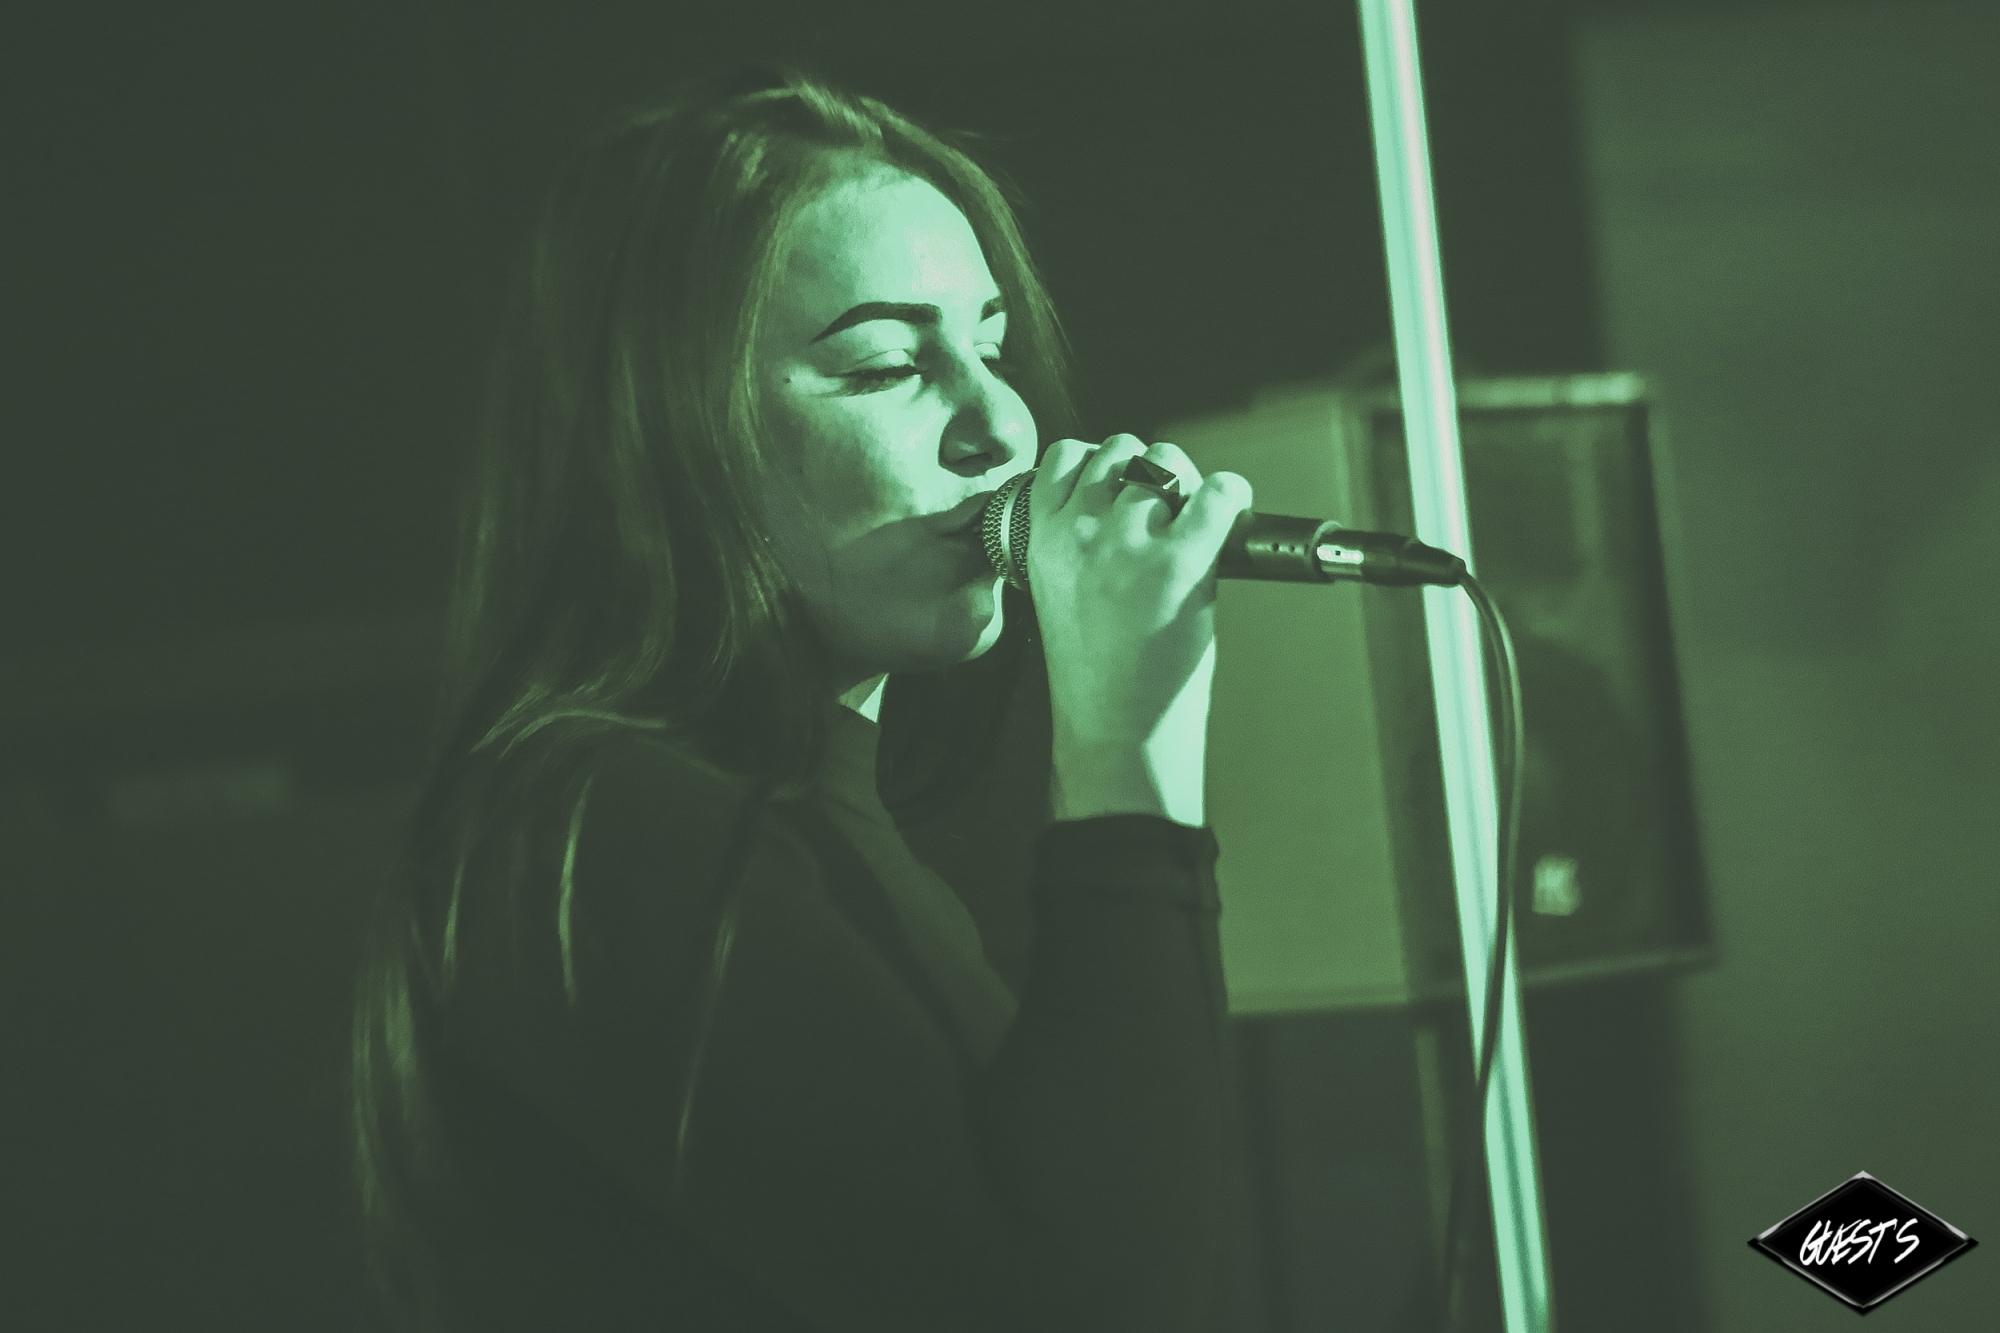 Quizz Musical Live Band - Mercredi 26 Avril 2017 - 20